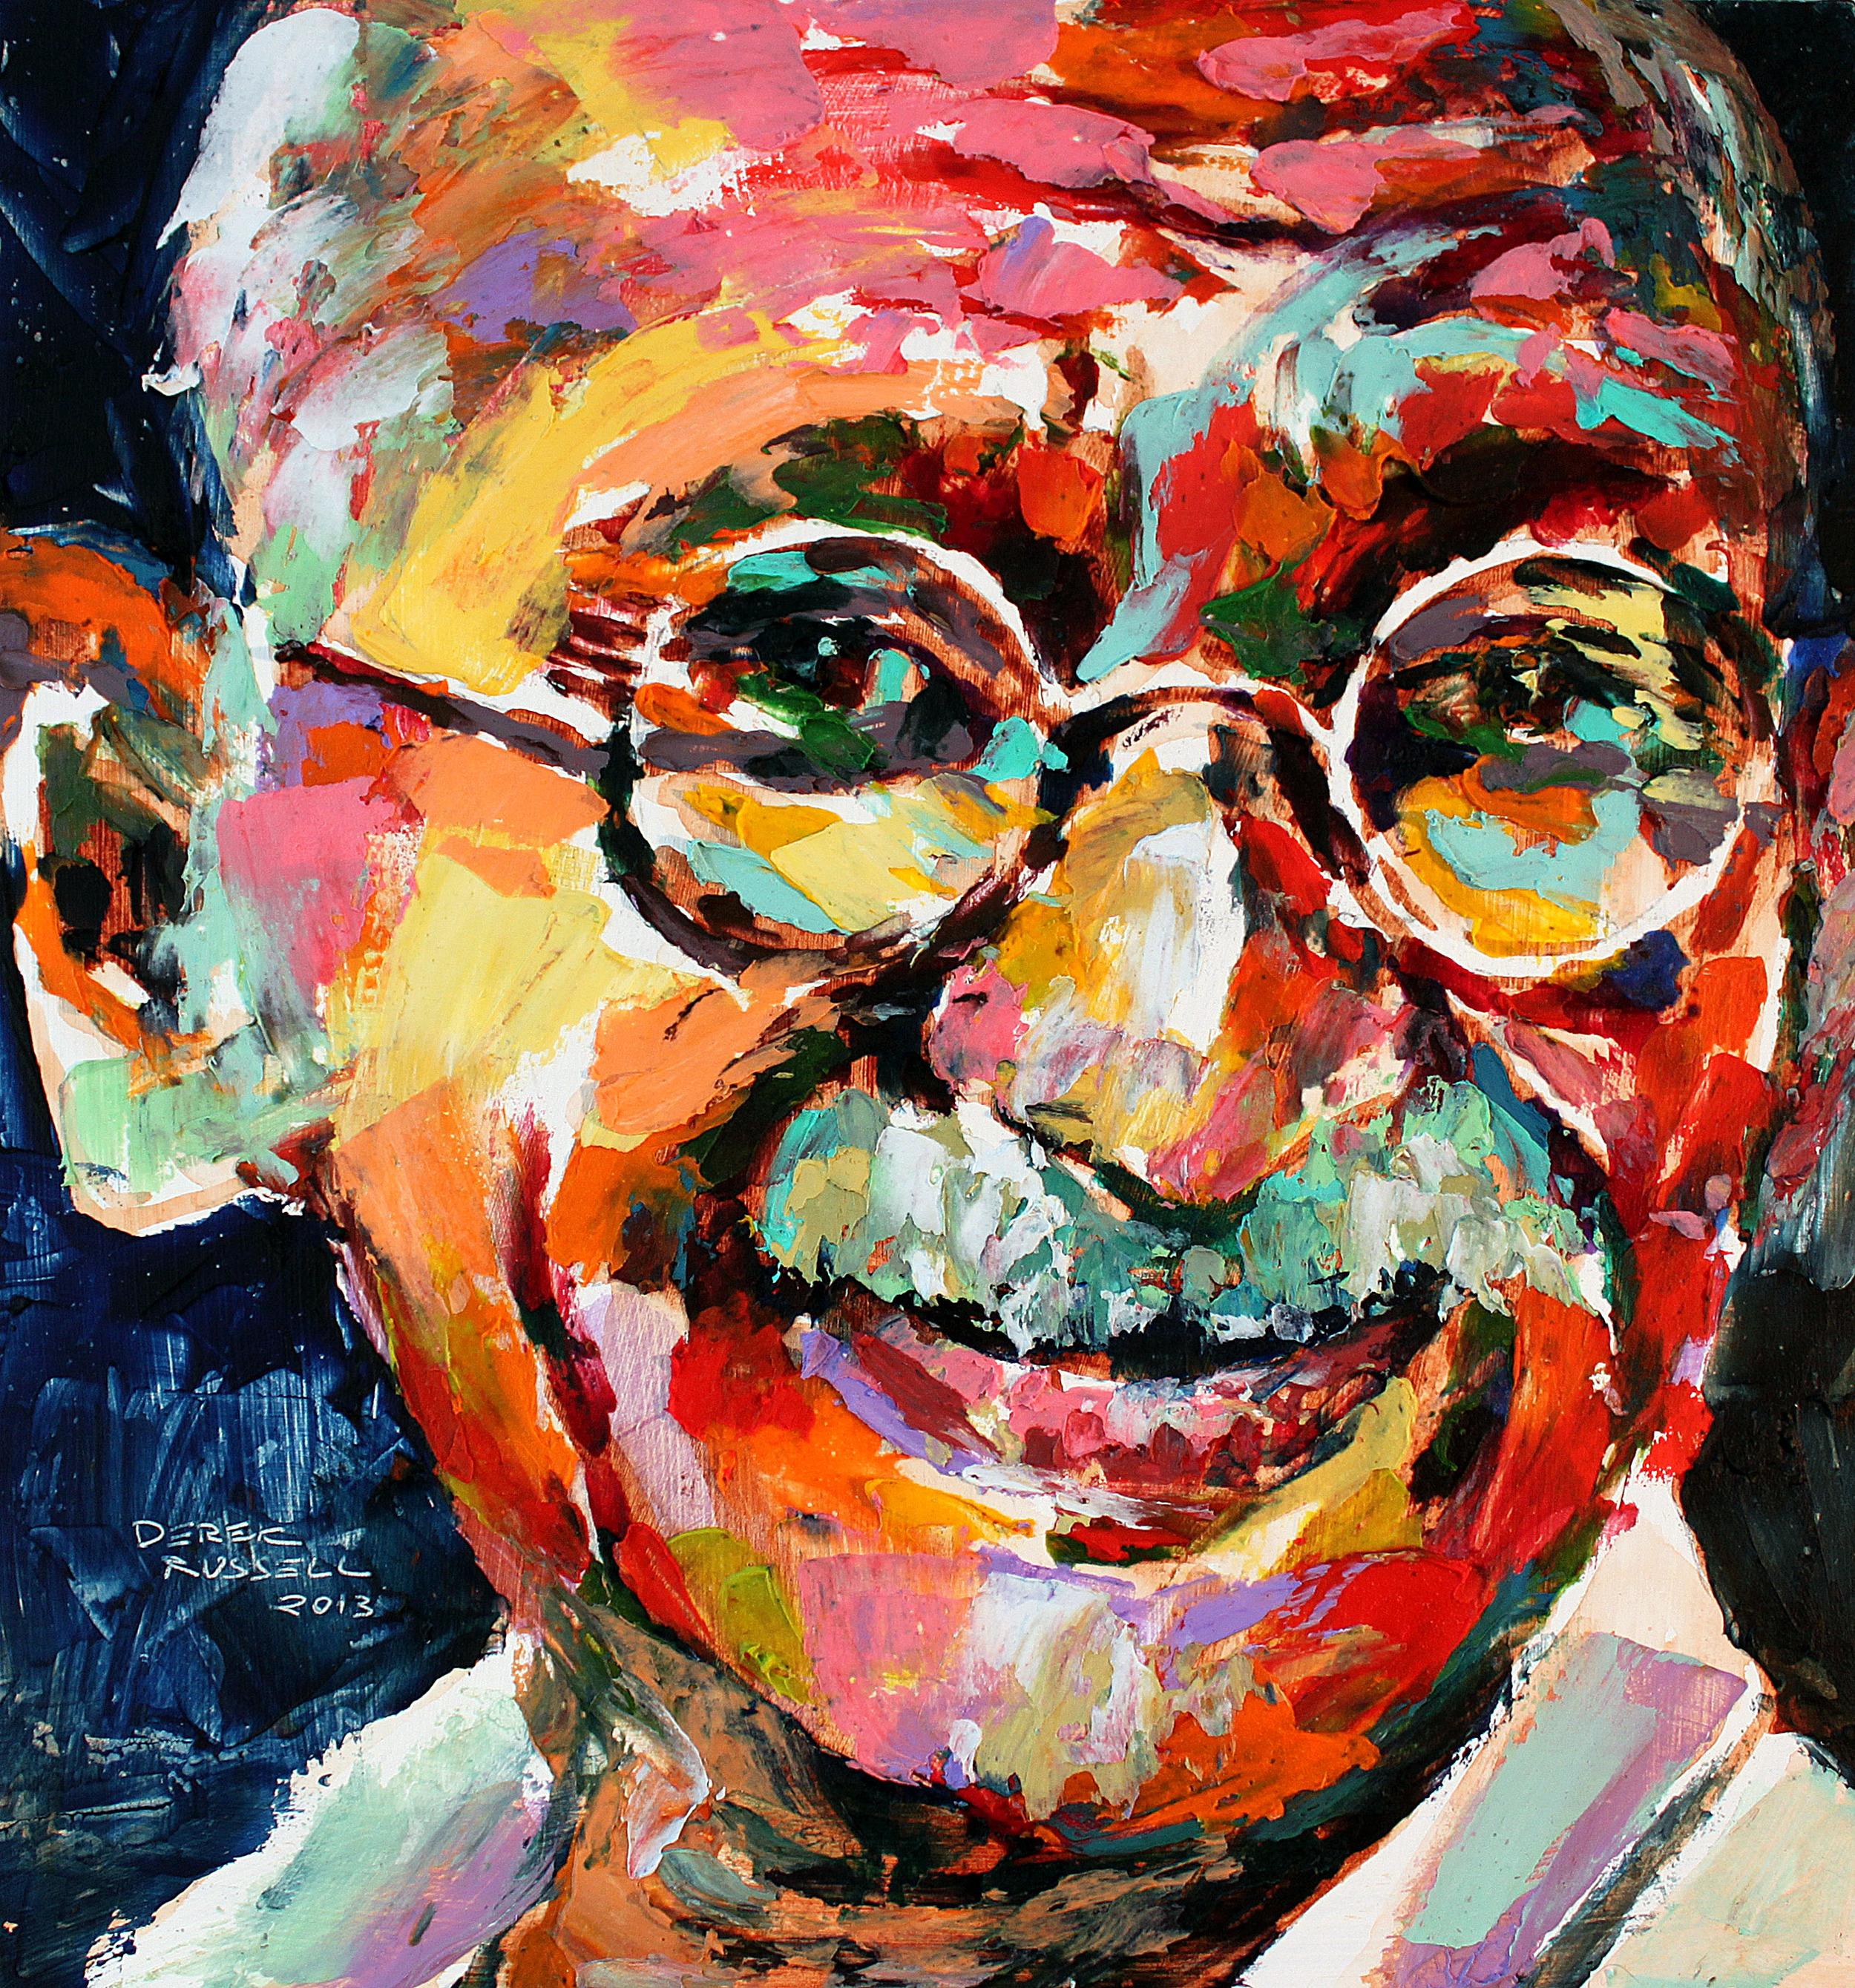 Mahatma Gandhi Original Acrylic & Oil Portrait Painting by Artist Derek Russell 2013.jpg